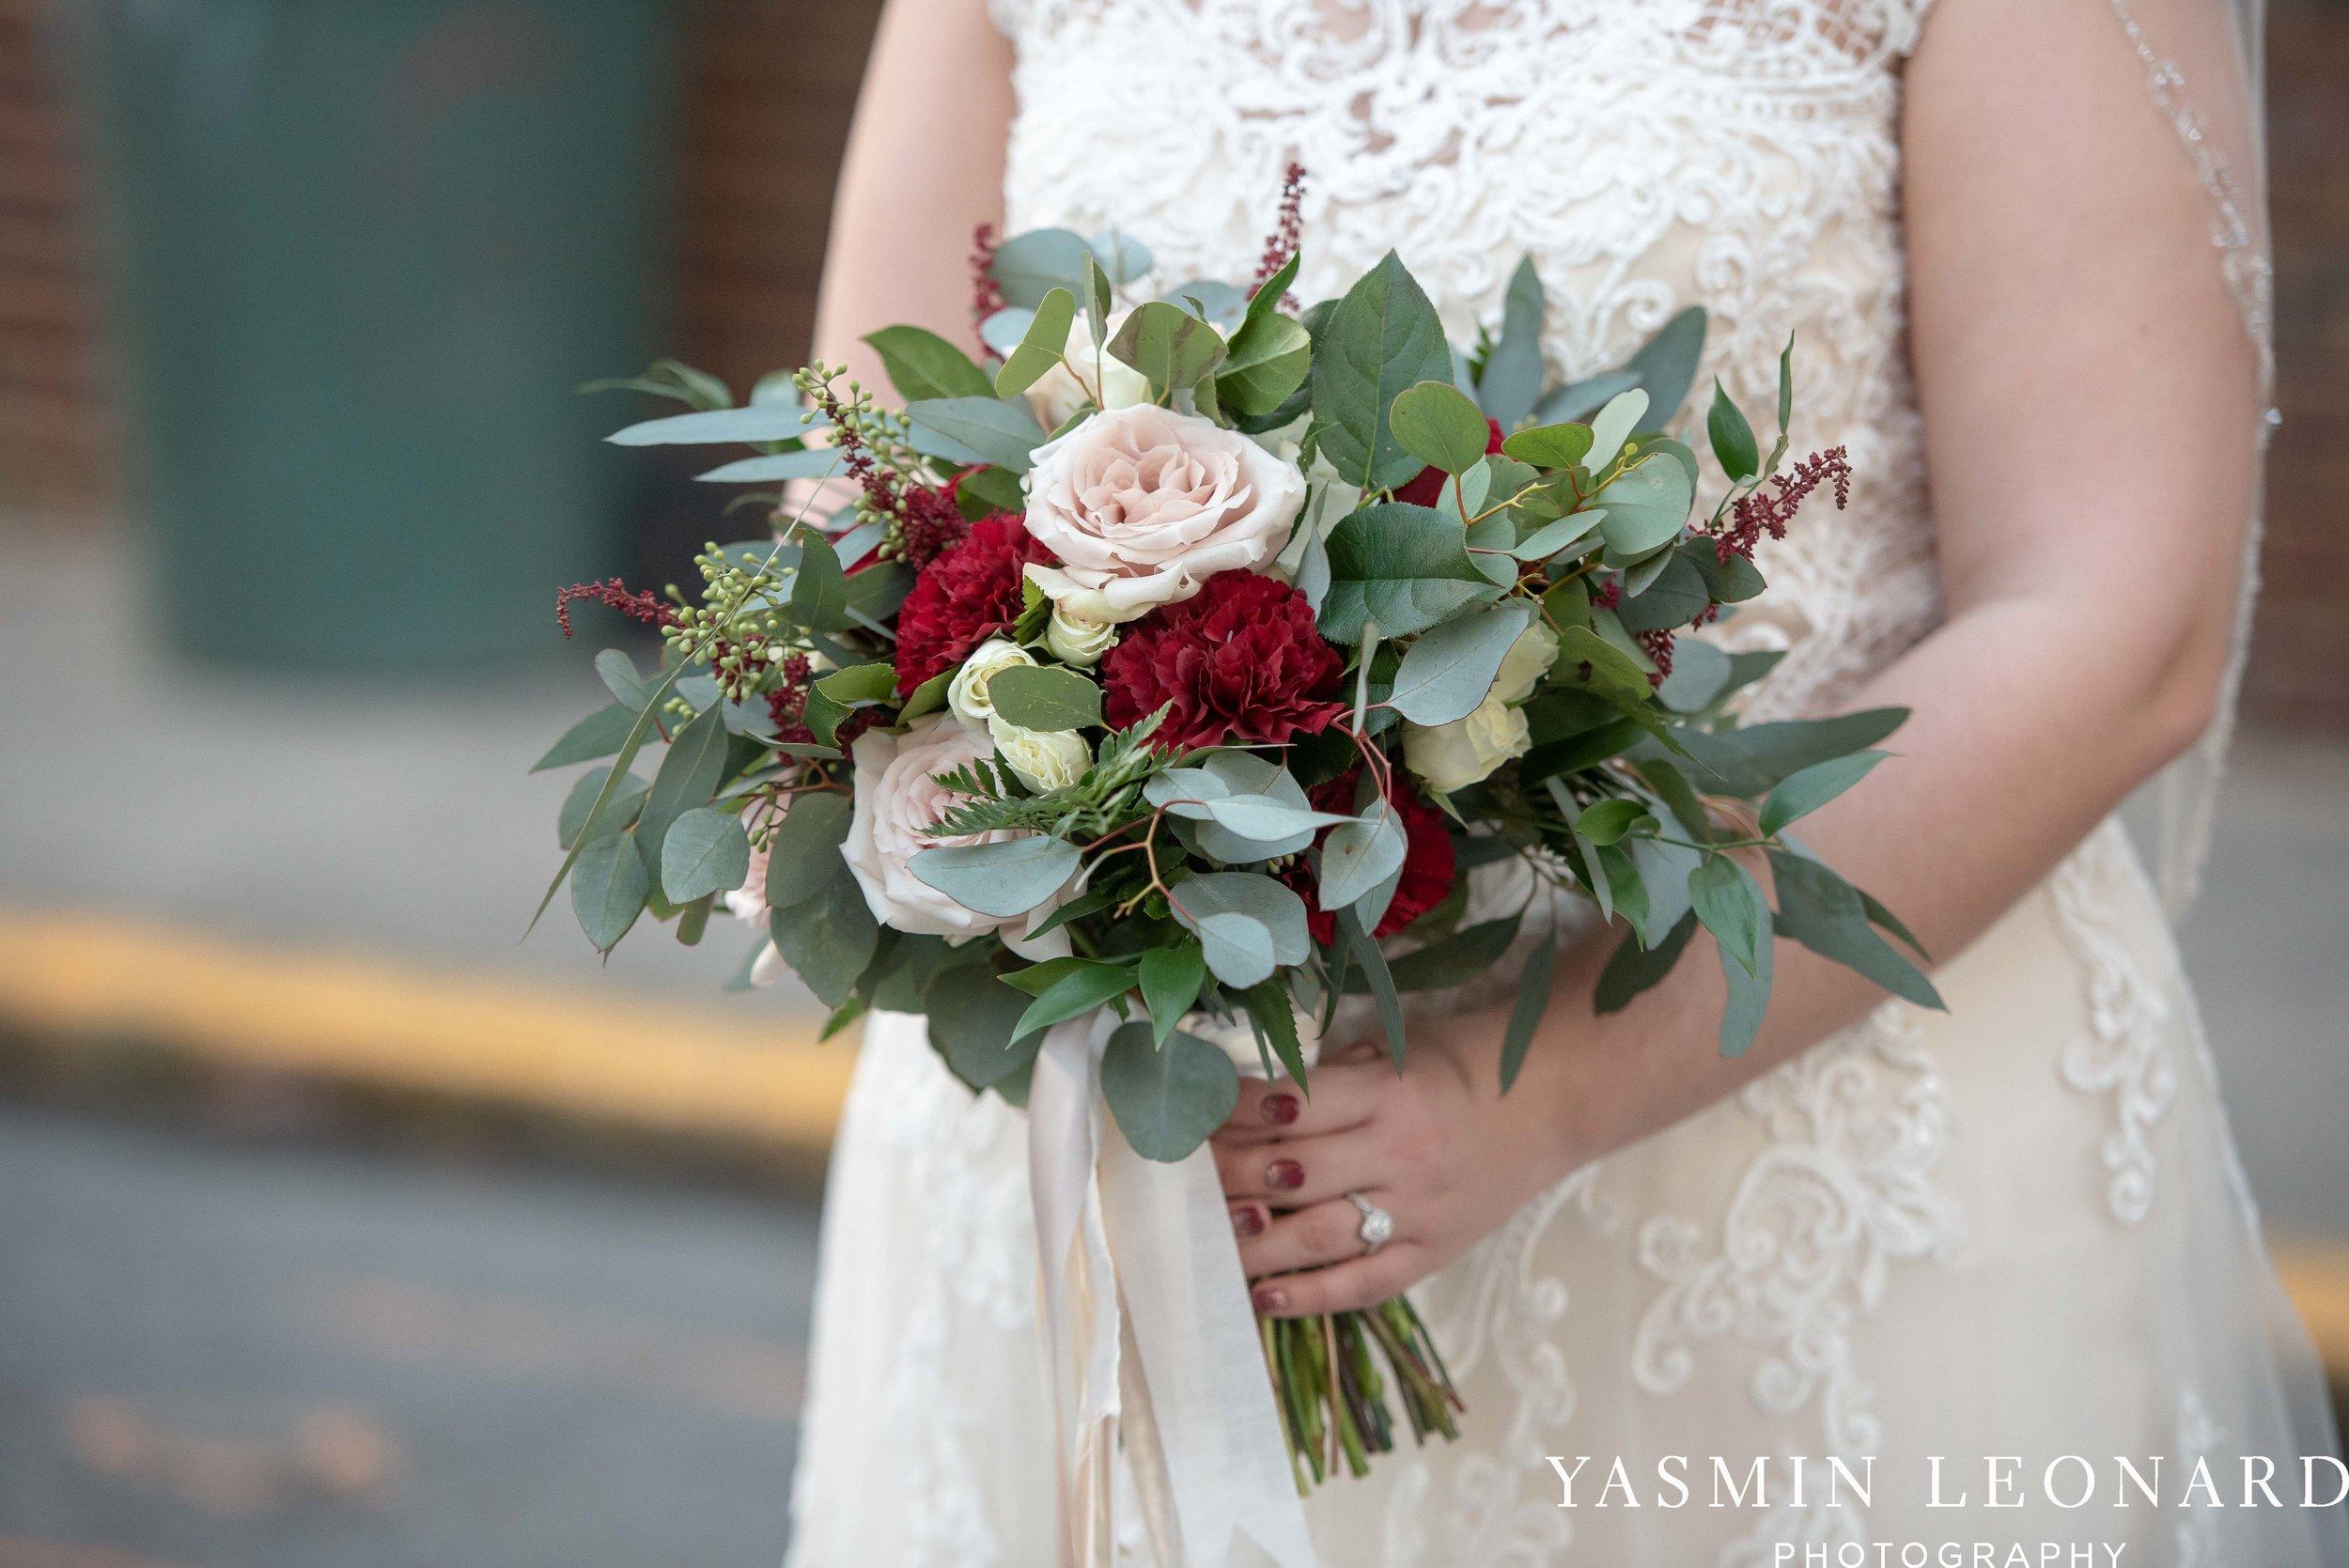 Rebekah and Matt - 105 Worth Event Centre - Yasmin Leonard Photography - Asheboro Wedding - NC Wedding - High Point Weddings - Triad Weddings - Winter Wedding-14.jpg